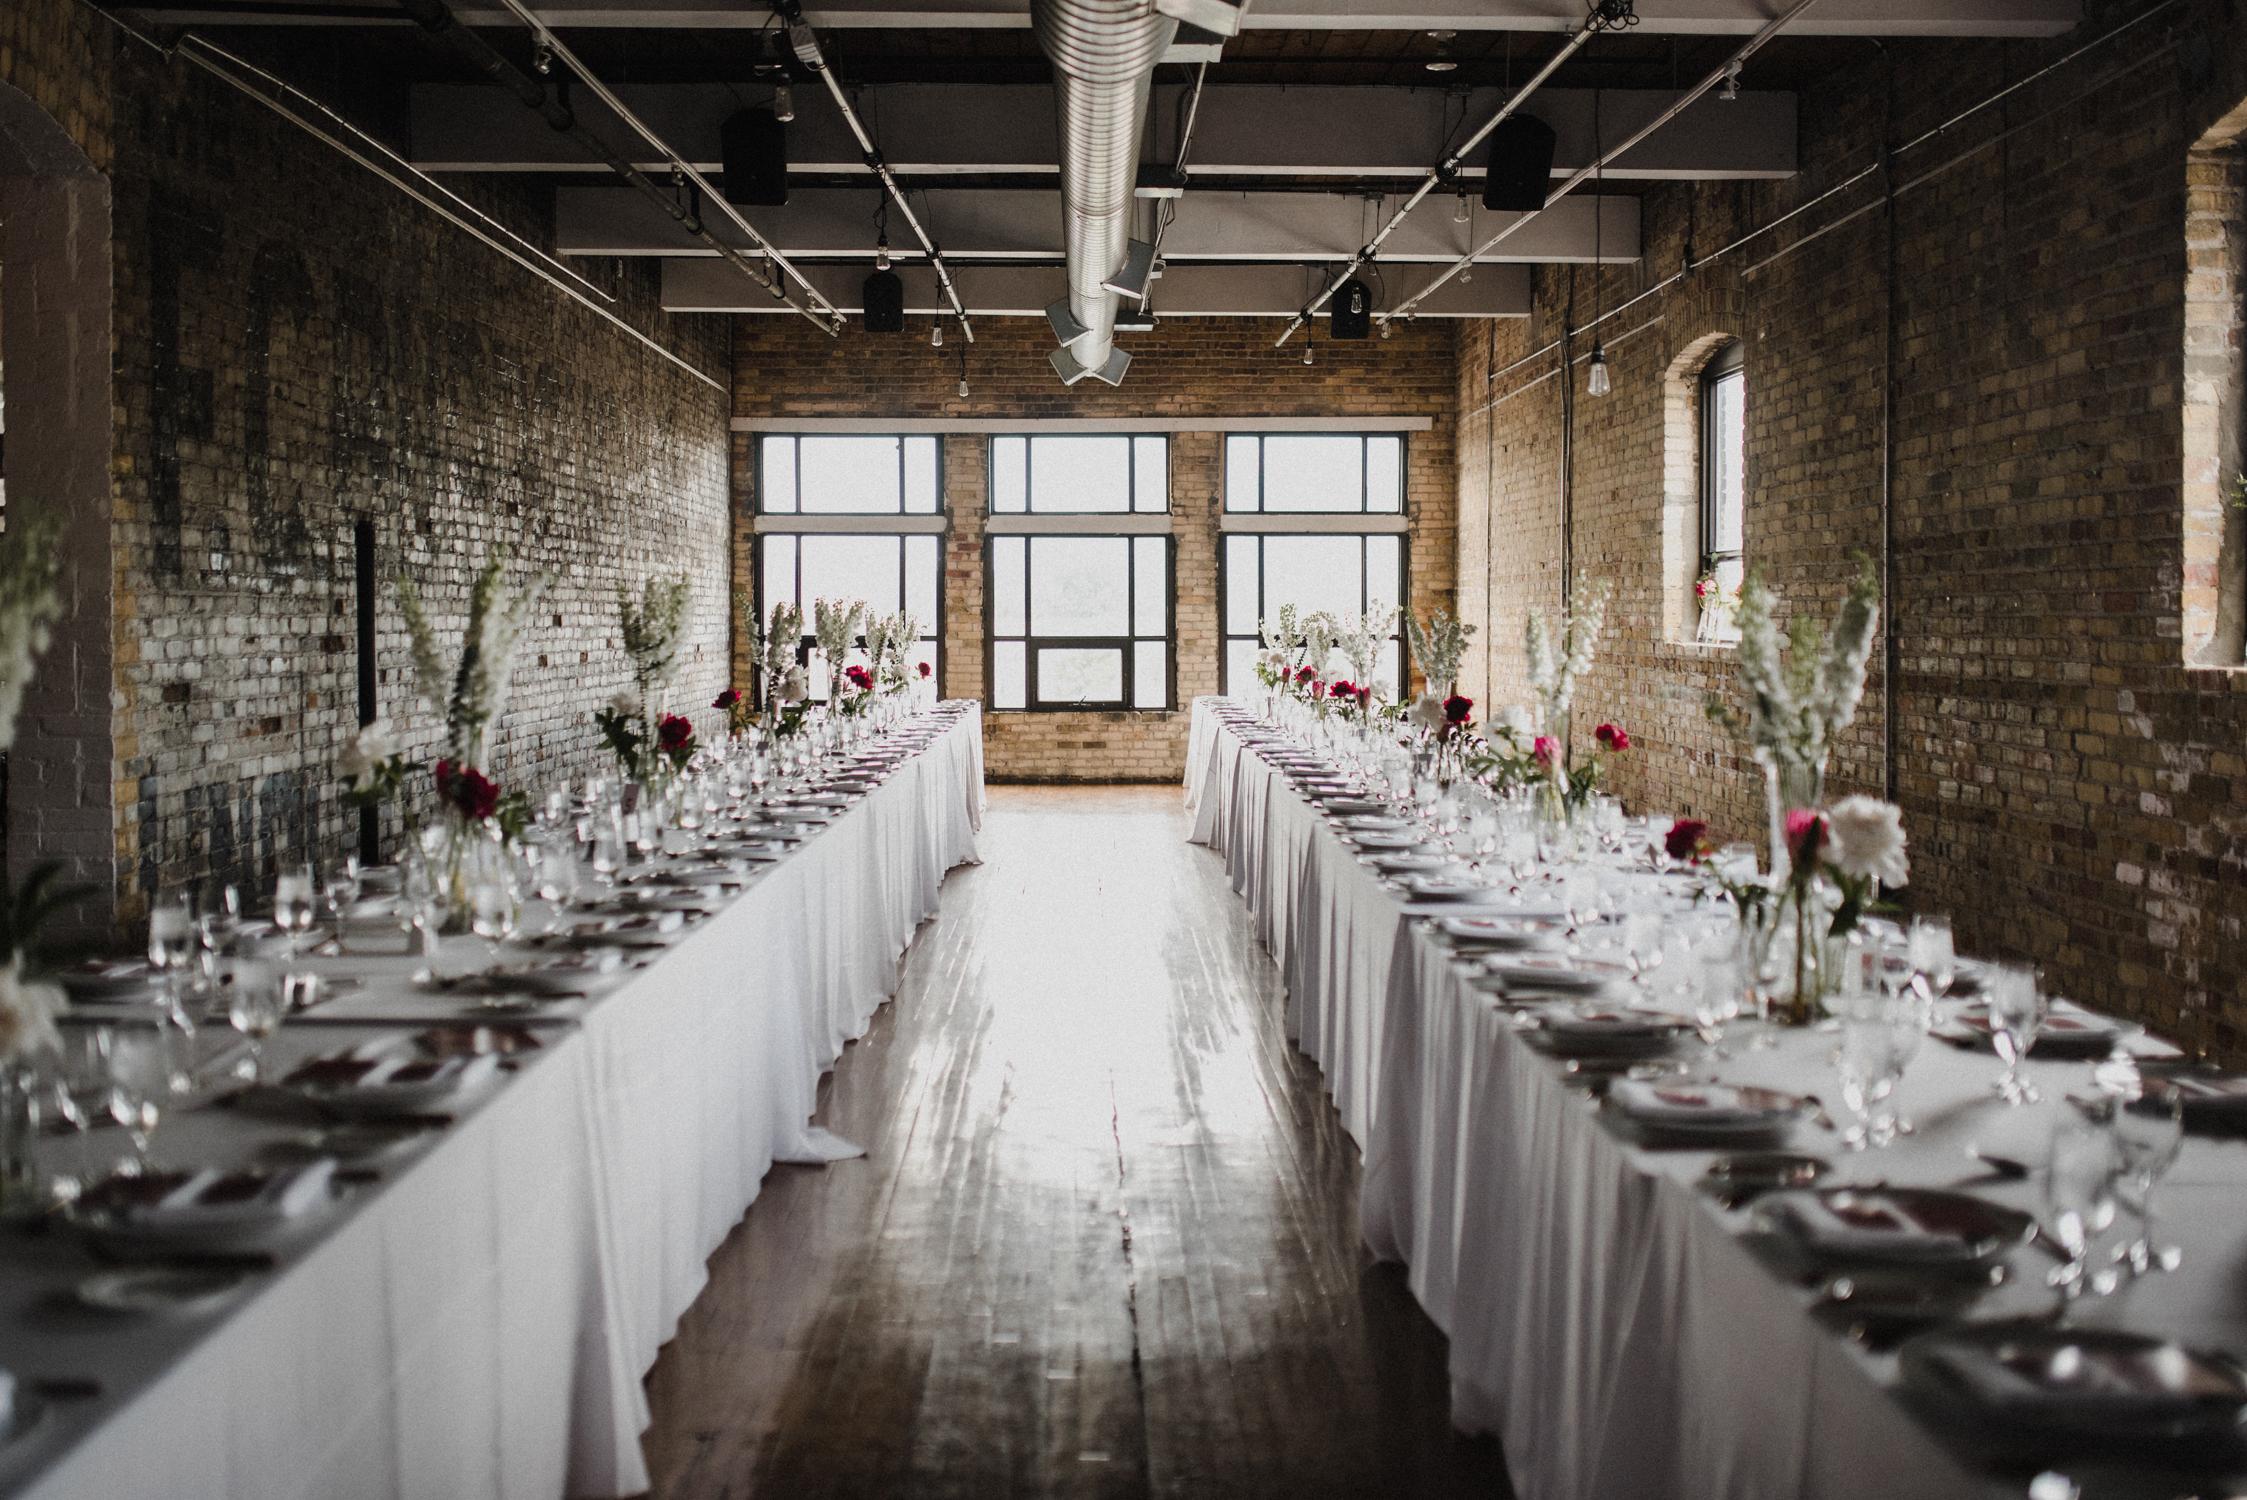 Documentary wedding photographer Tami Klein captures Maytal & Ryan's one-of-a-kind Gladstone Hotel wedding in Toronto, Ontario.